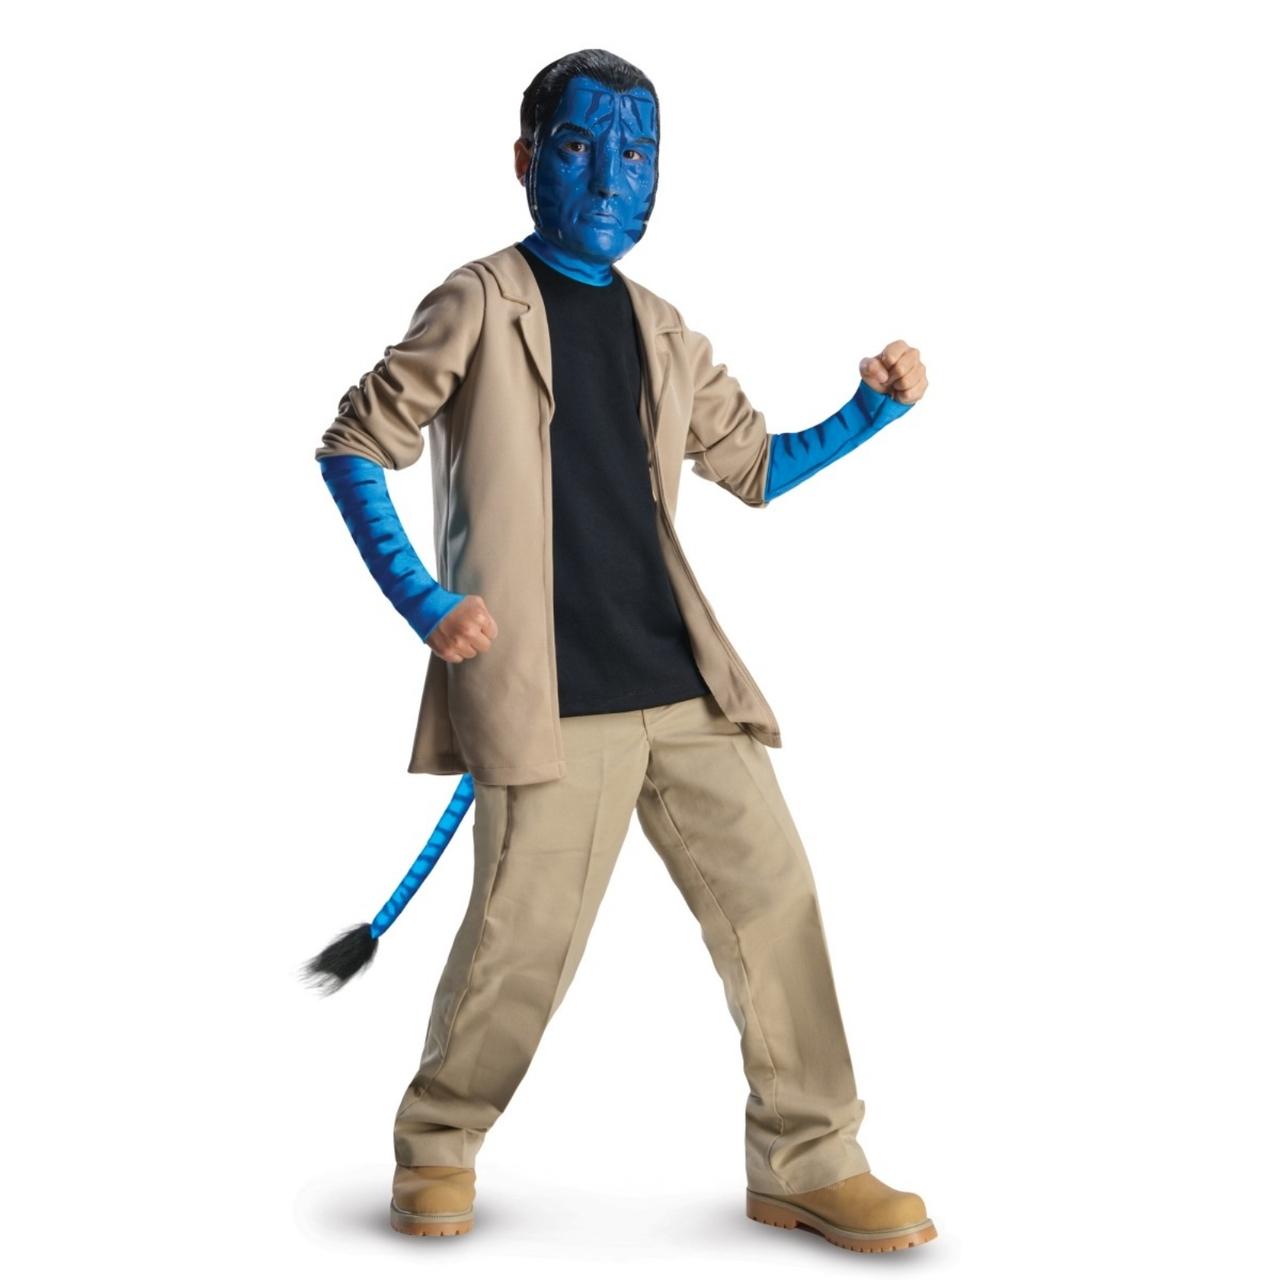 jake sully children's deluxe avatar costume - the costume shoppe